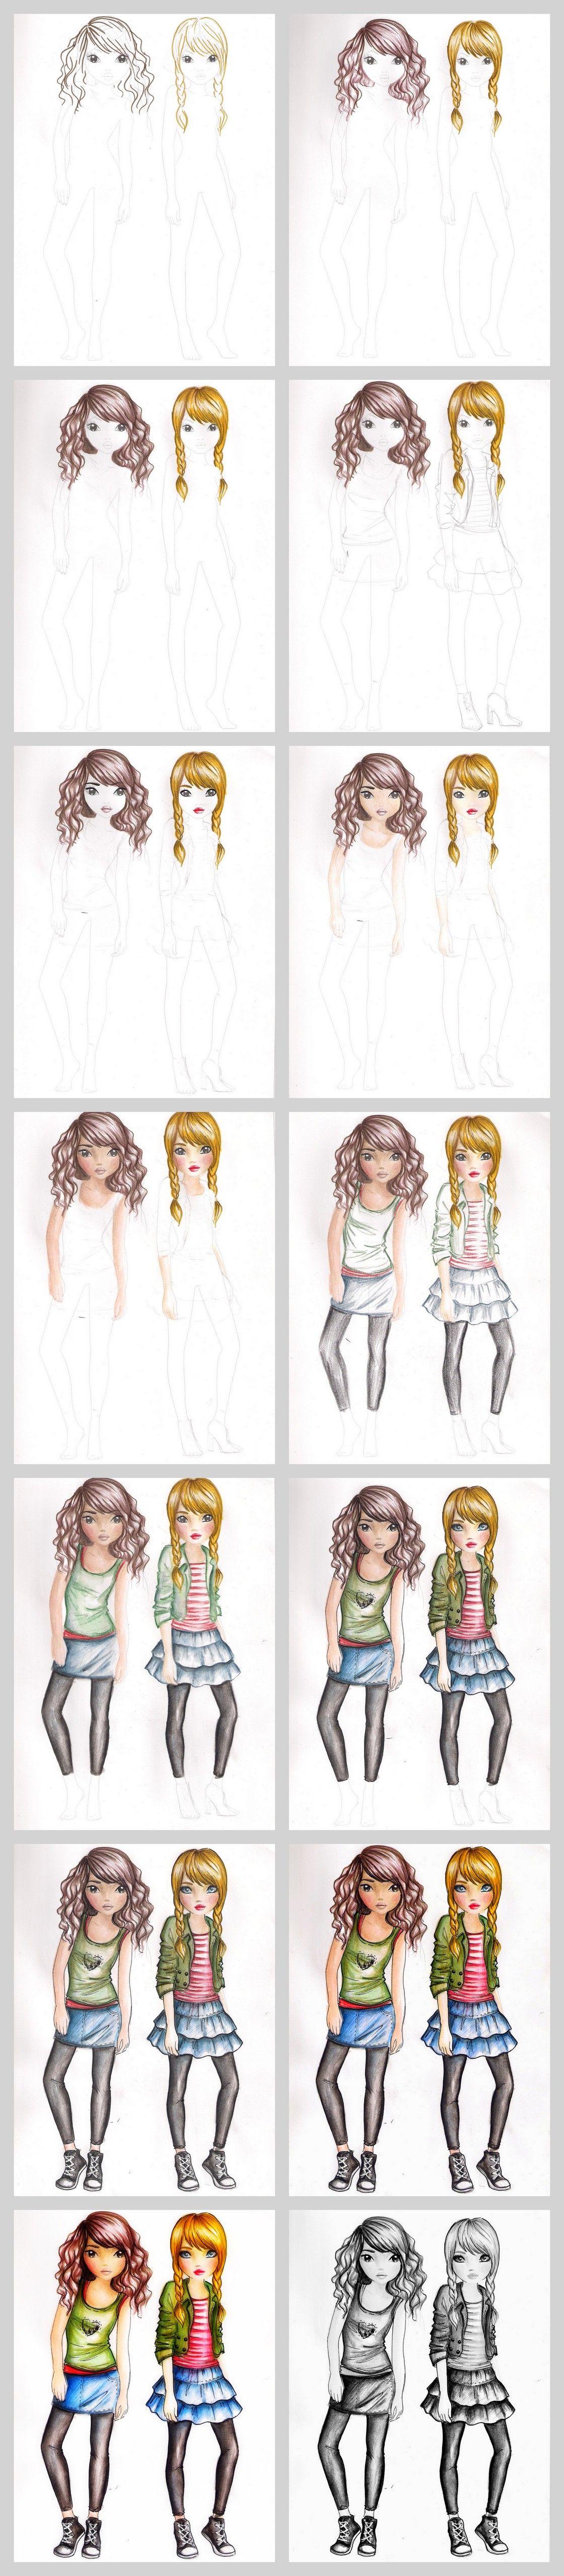 TopModel drawing tutorial by funandcake